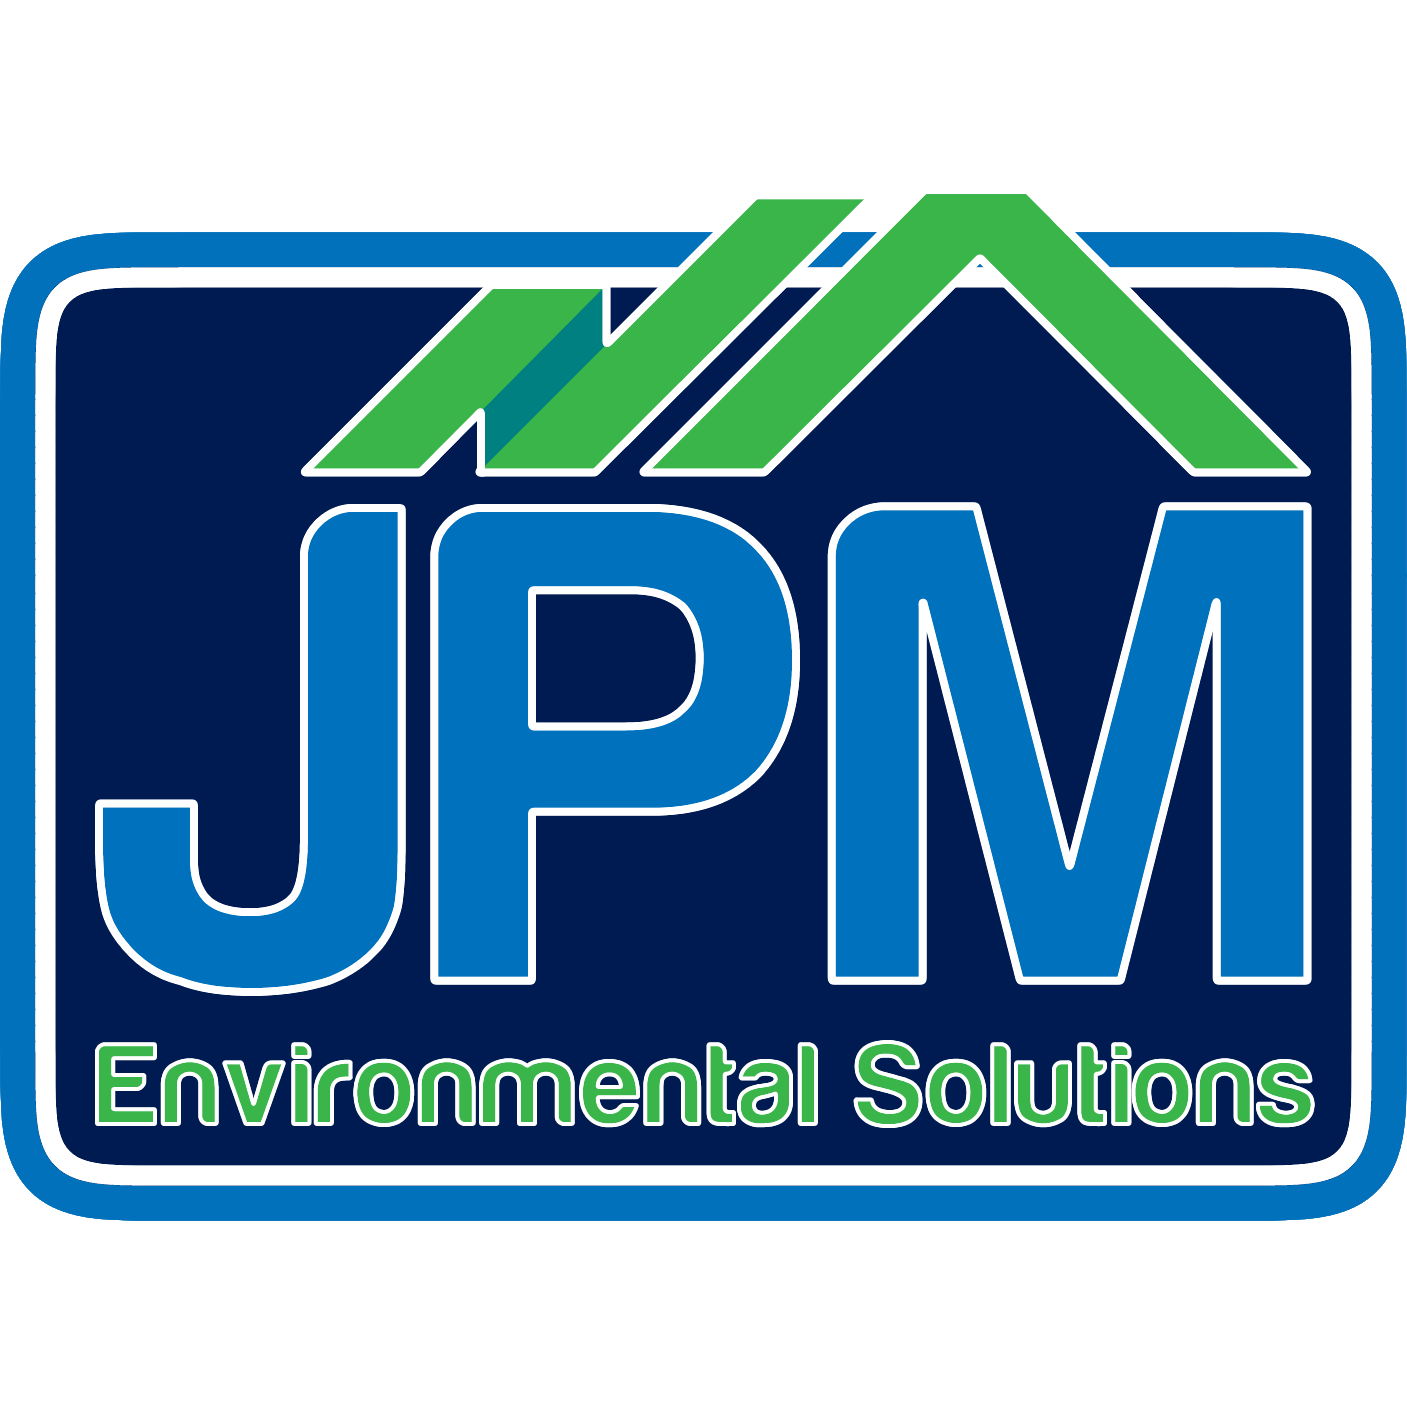 JPM Environmental Solutions, LLC - Newburgh, NY 12550 - (845)392-2370   ShowMeLocal.com